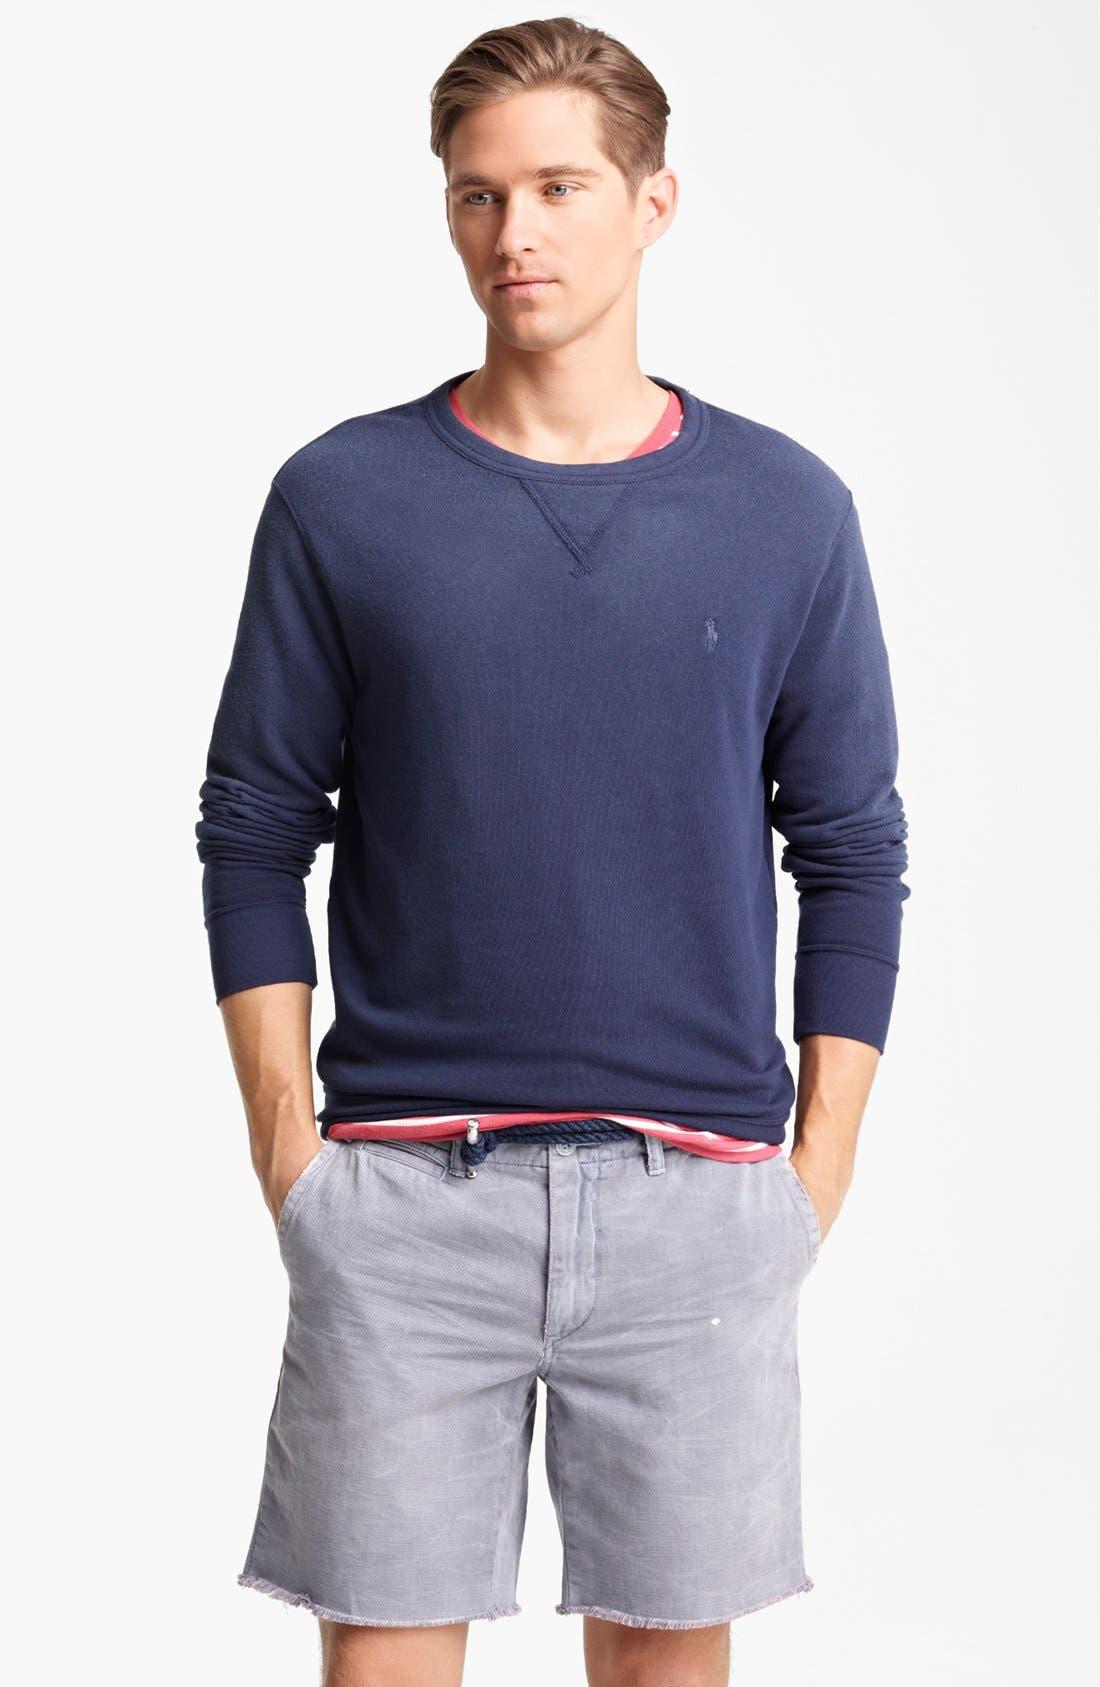 Main Image - Polo Ralph Lauren Sweat Shirt